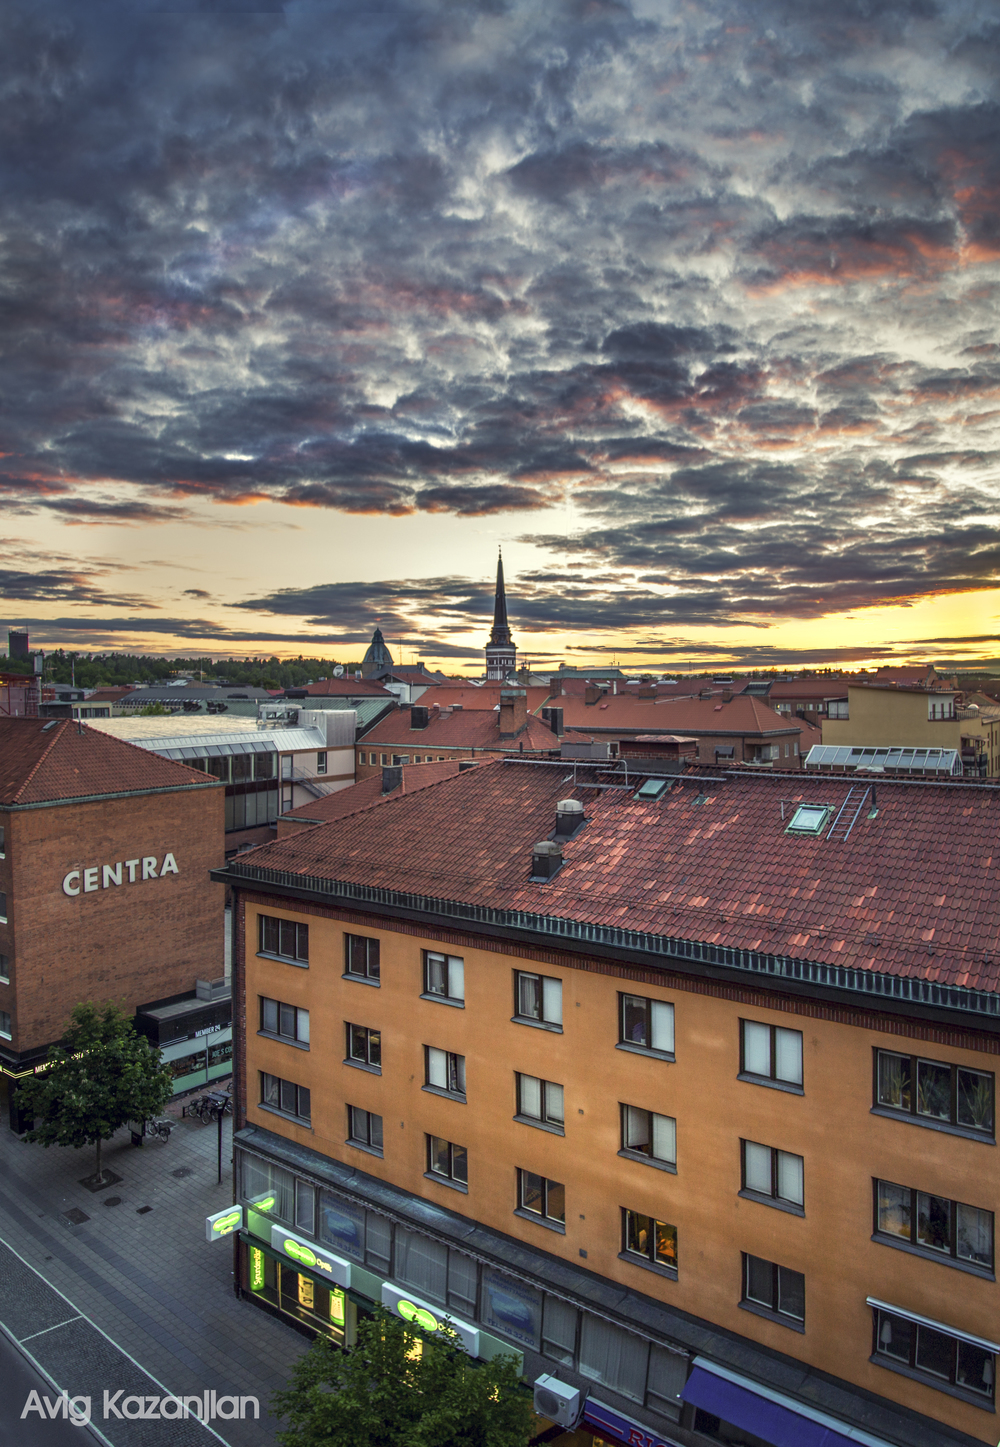 Sunset in Västerås